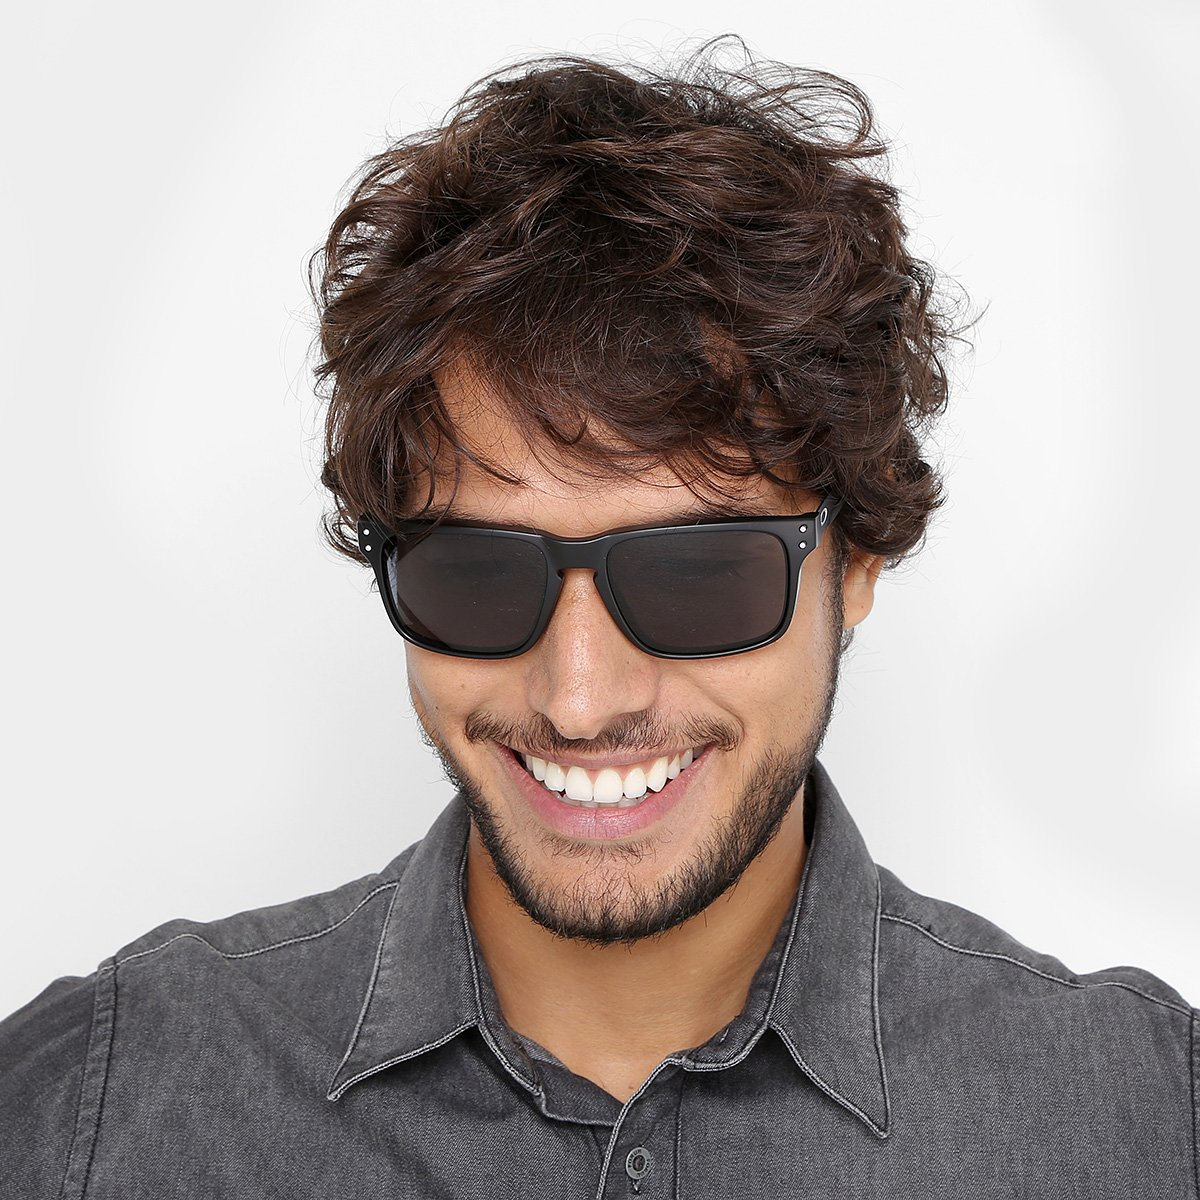 Óculos de Sol Oakley Holbrook Mix - Preto - Compre Agora   Netshoes bba0e30287